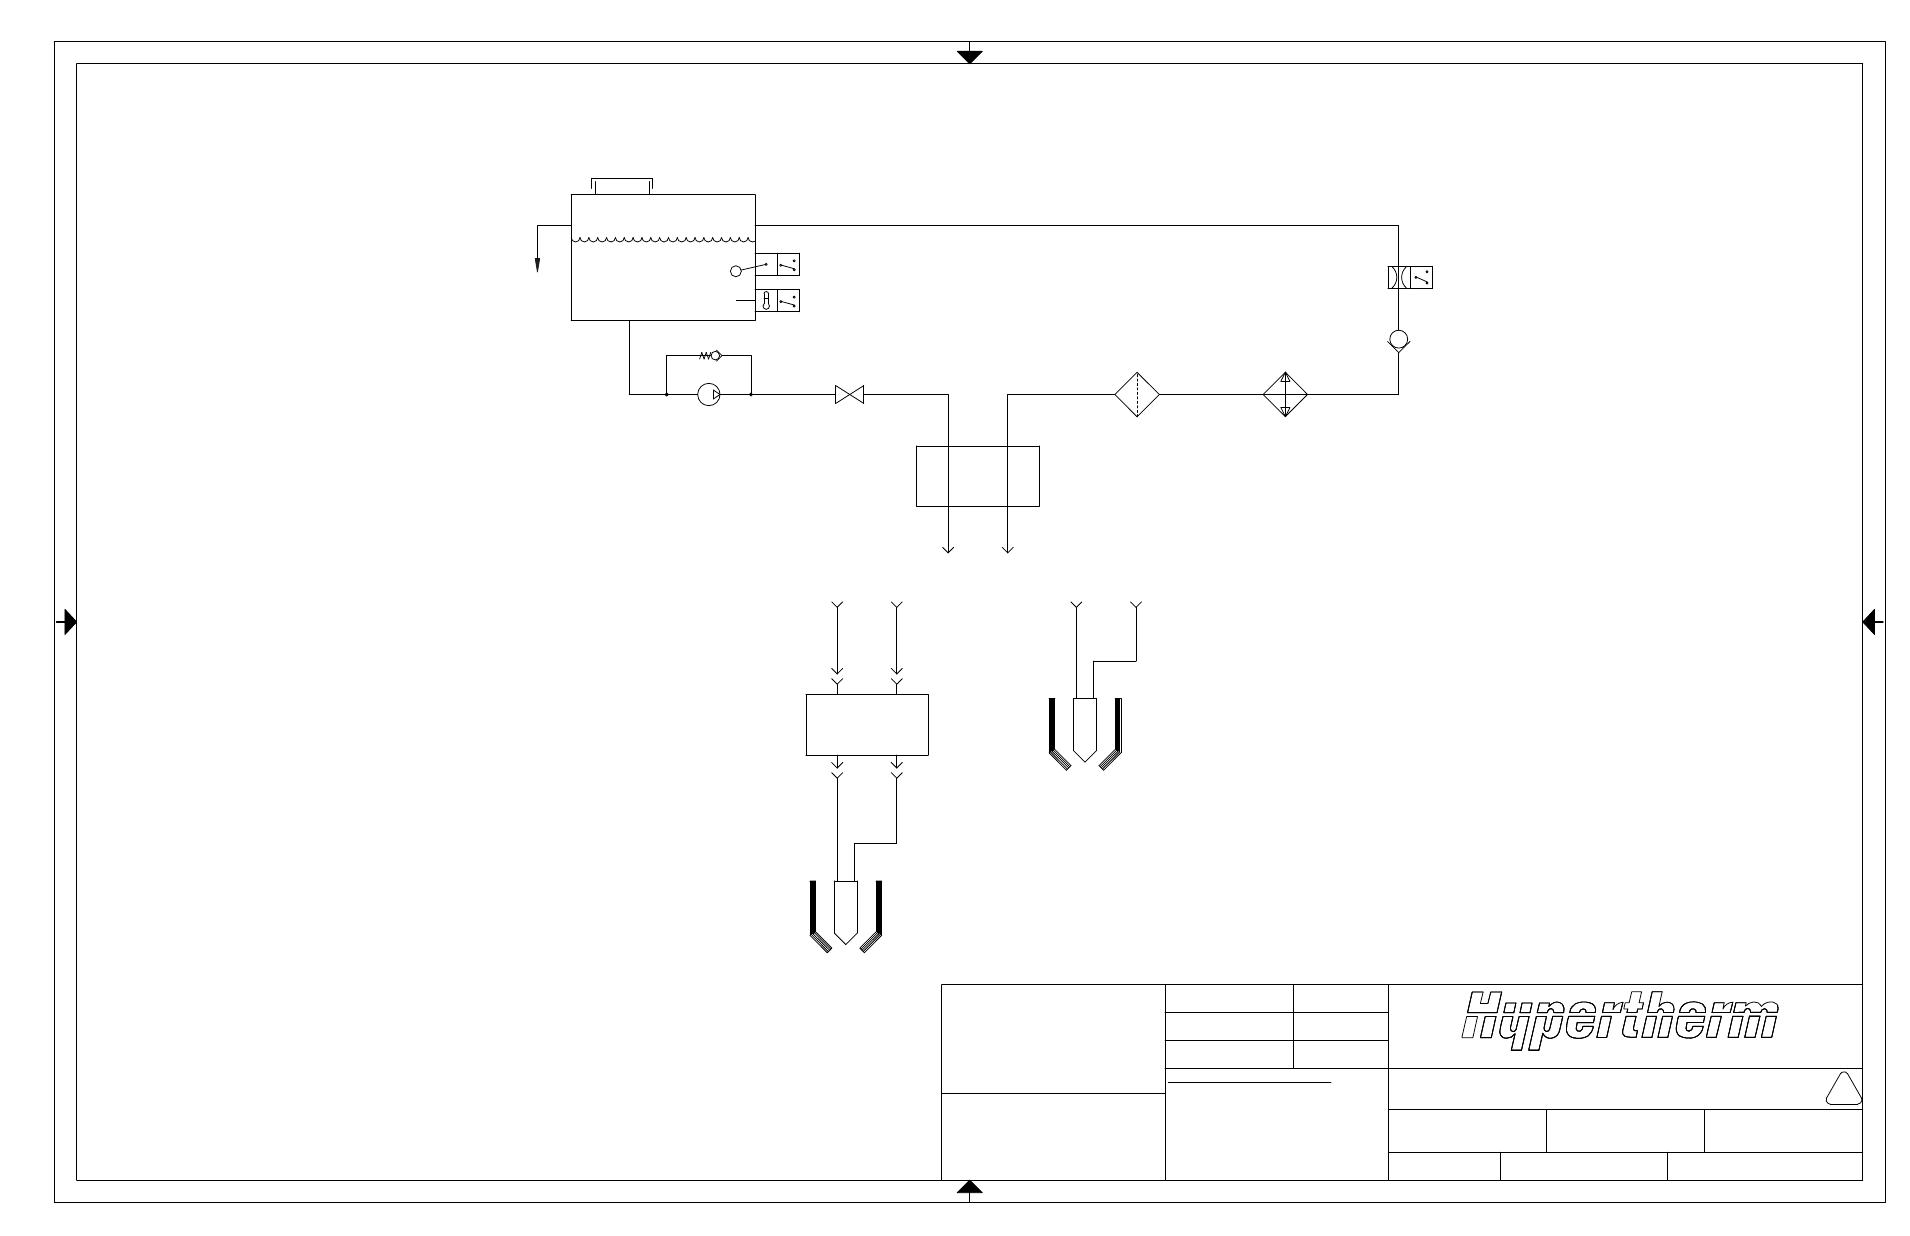 Cooling System Schematic Diagram Kia Sorento Coolant 1910x1236